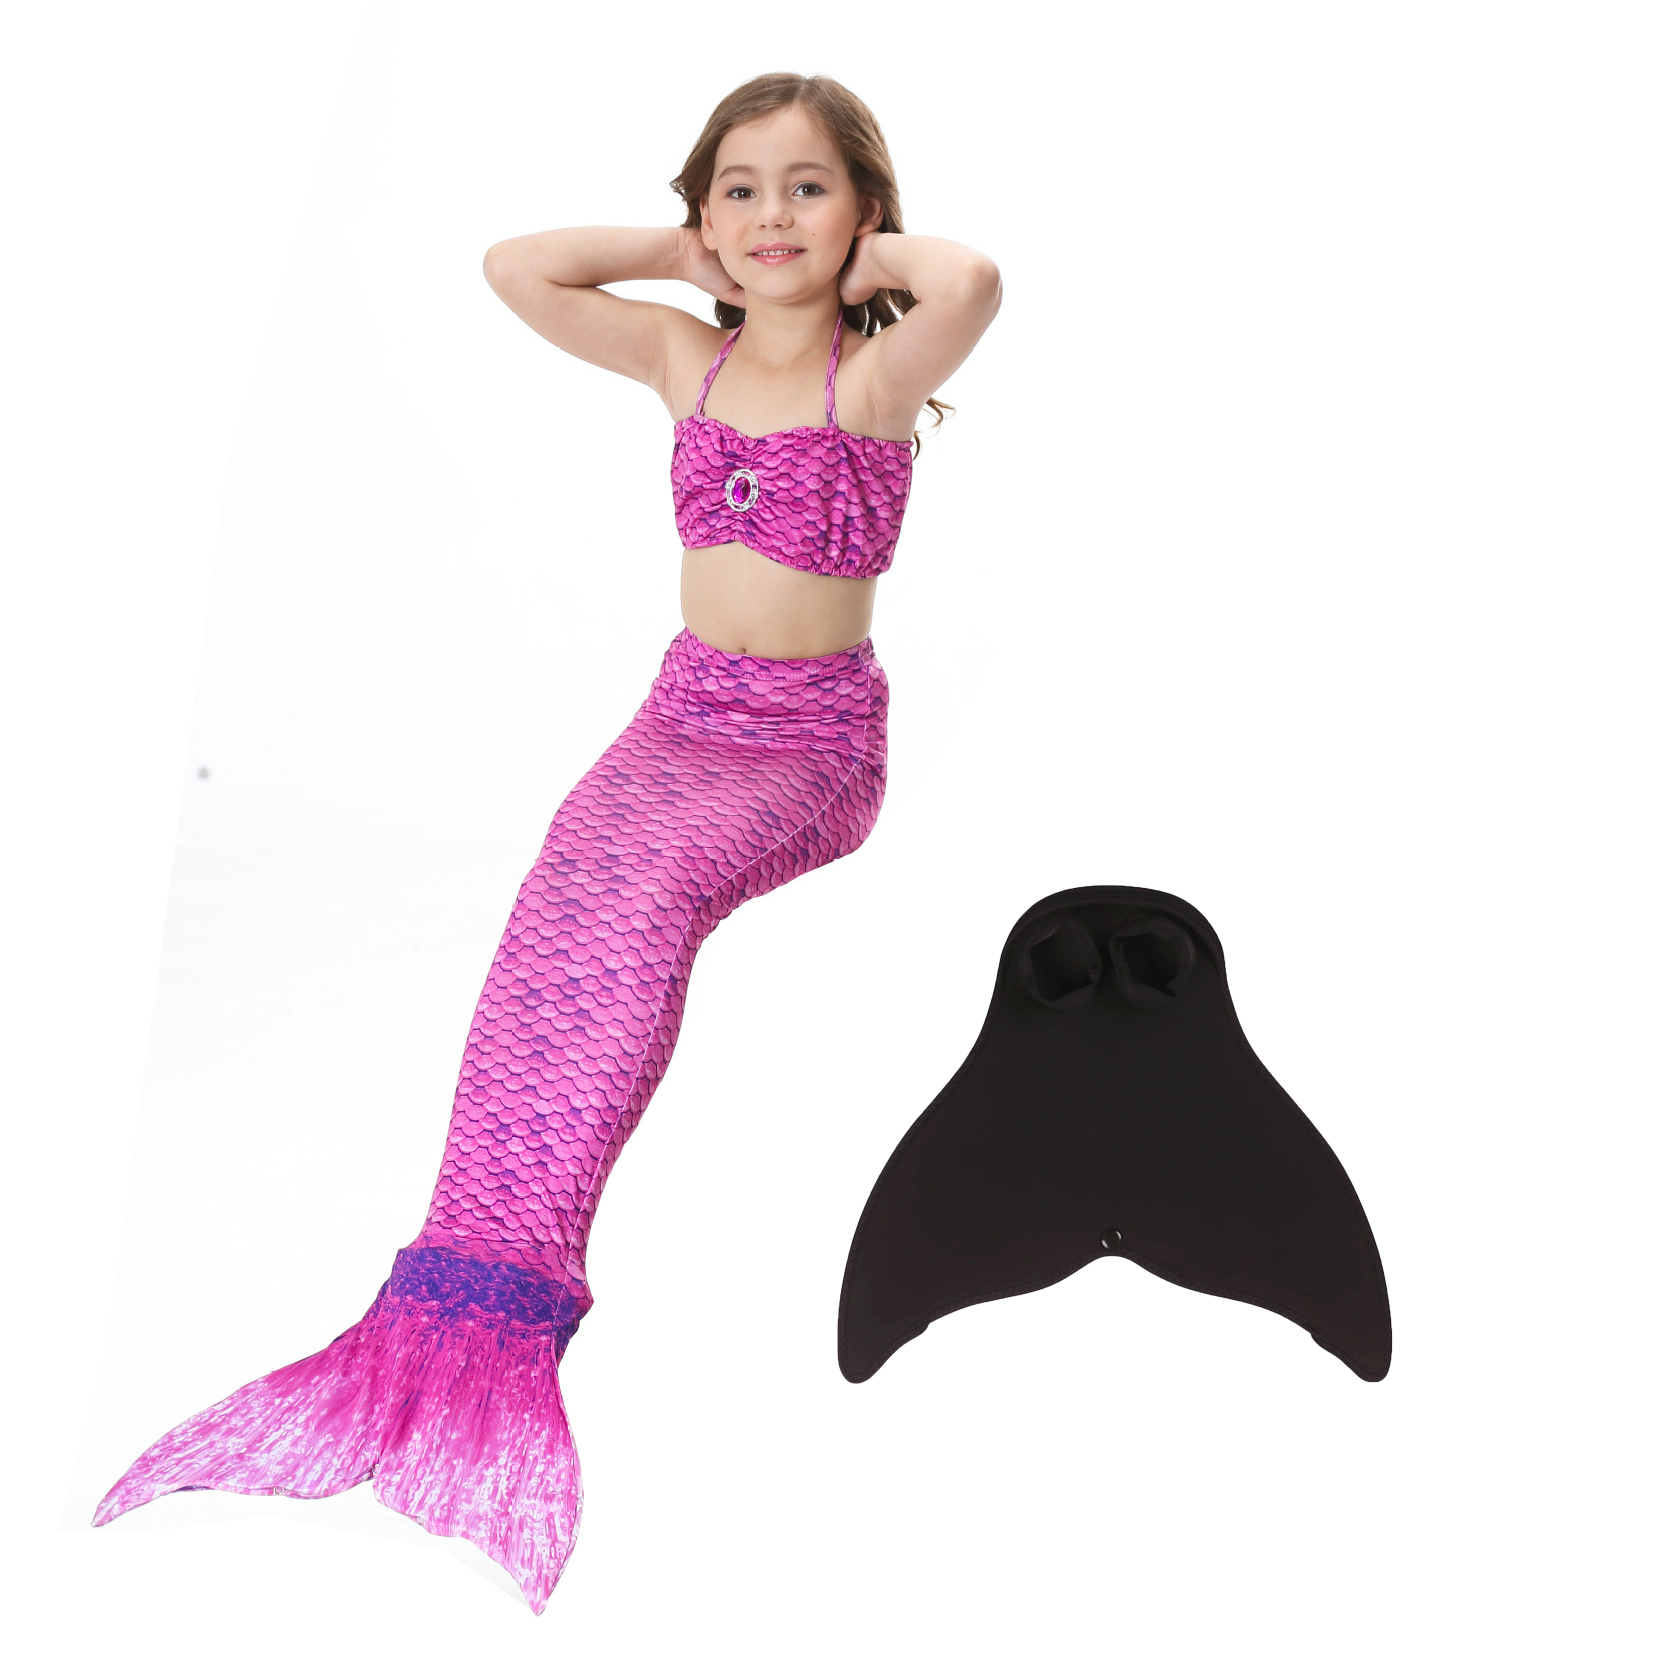 New Fashion Infantil Fuchsia Yellow Pink Blue Red Bikini + Mermaid Tail Kids Swimwear 6t 8t 10 12 Years Girls Swimsuit